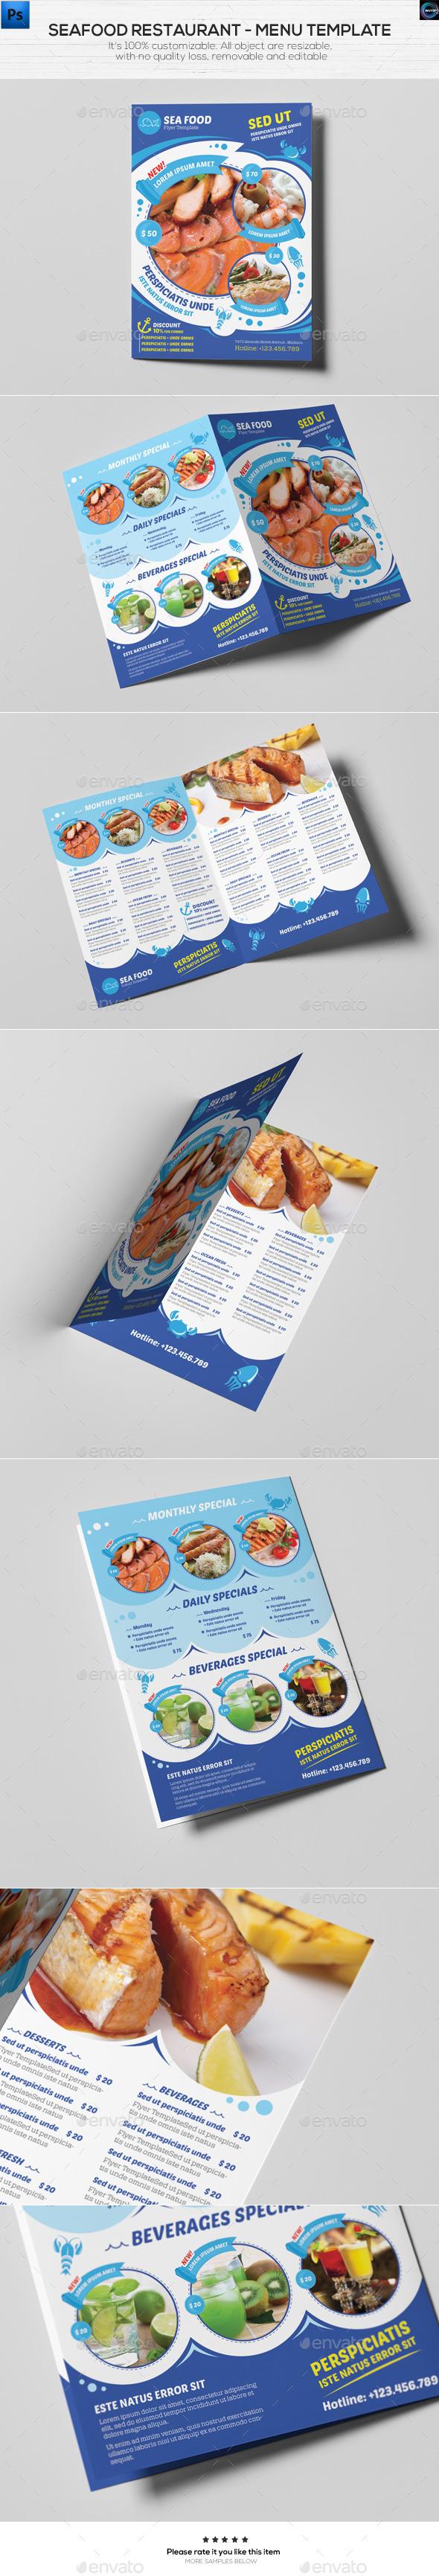 Seafood Restaurant - Menu Template - Food Menus Print Templates